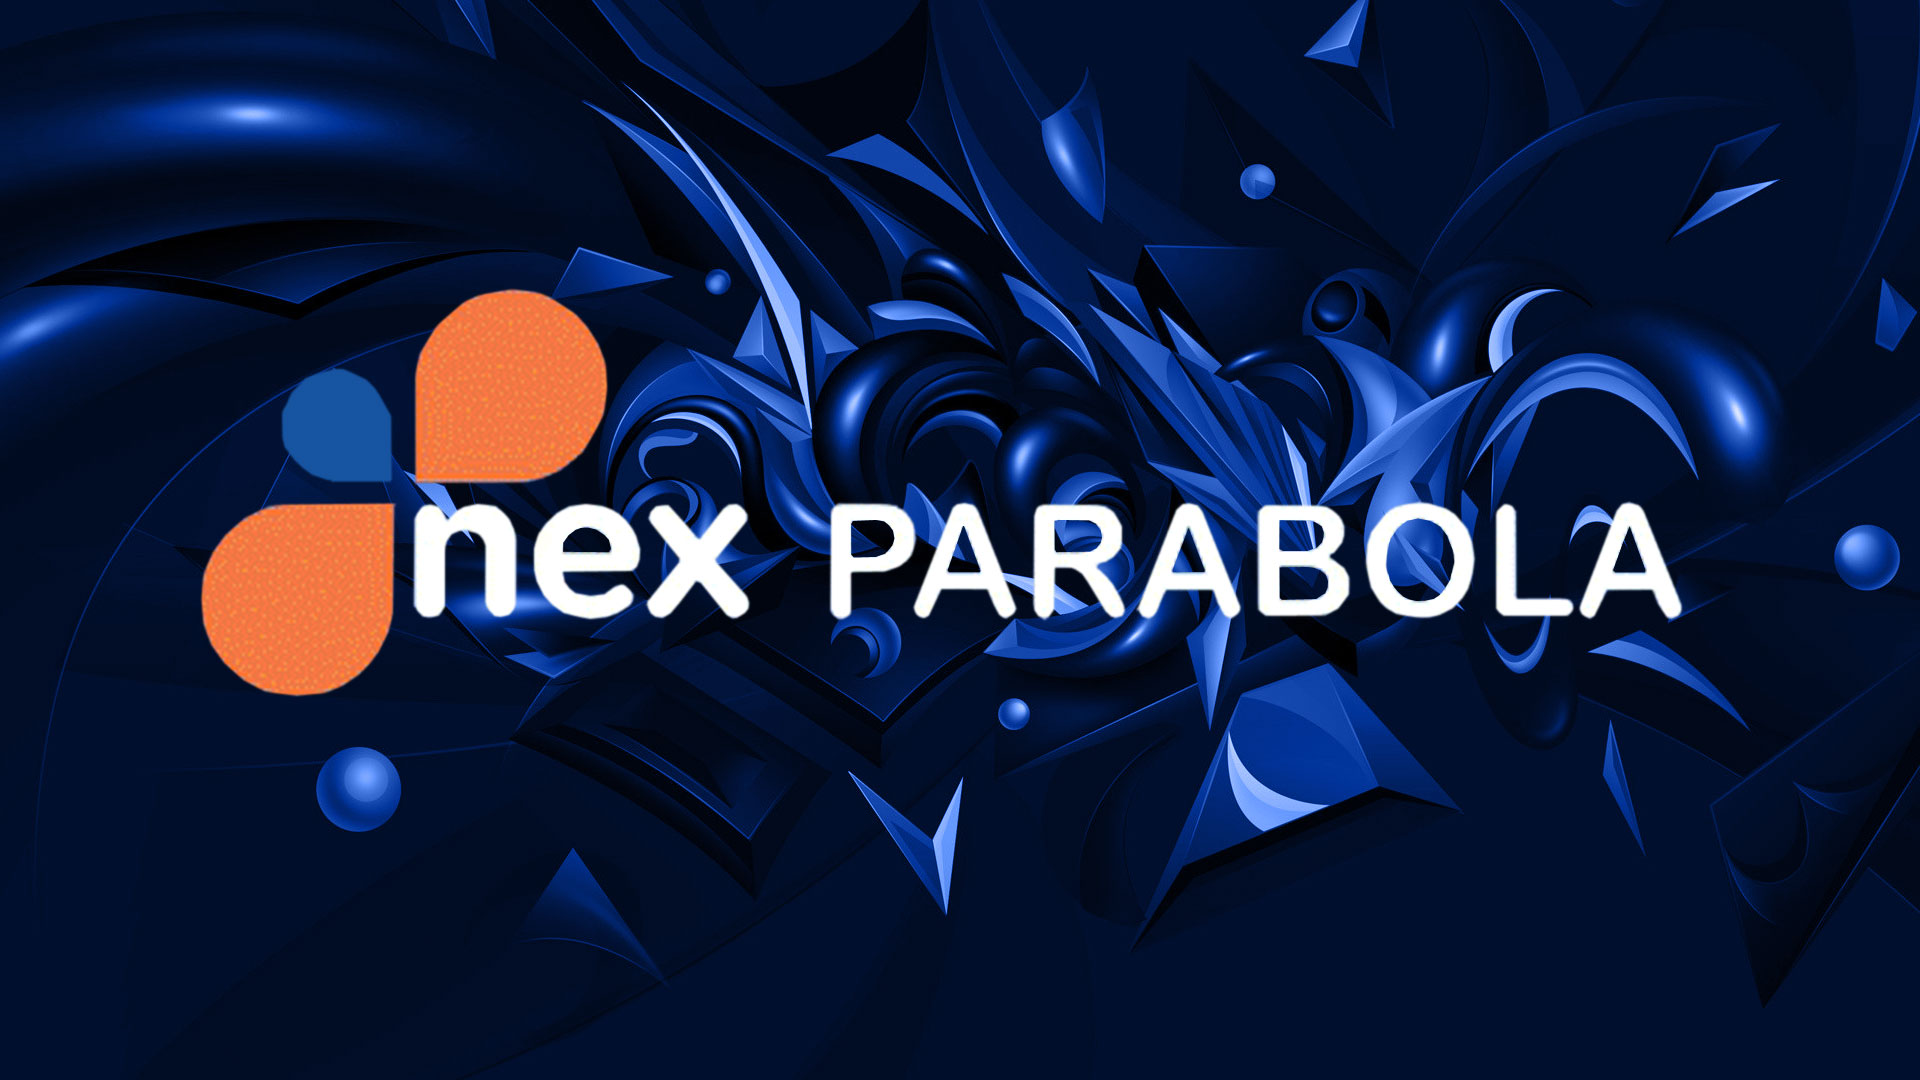 Daftar Frekuensi Channel Nex Parabola Terbaru Telkom 4